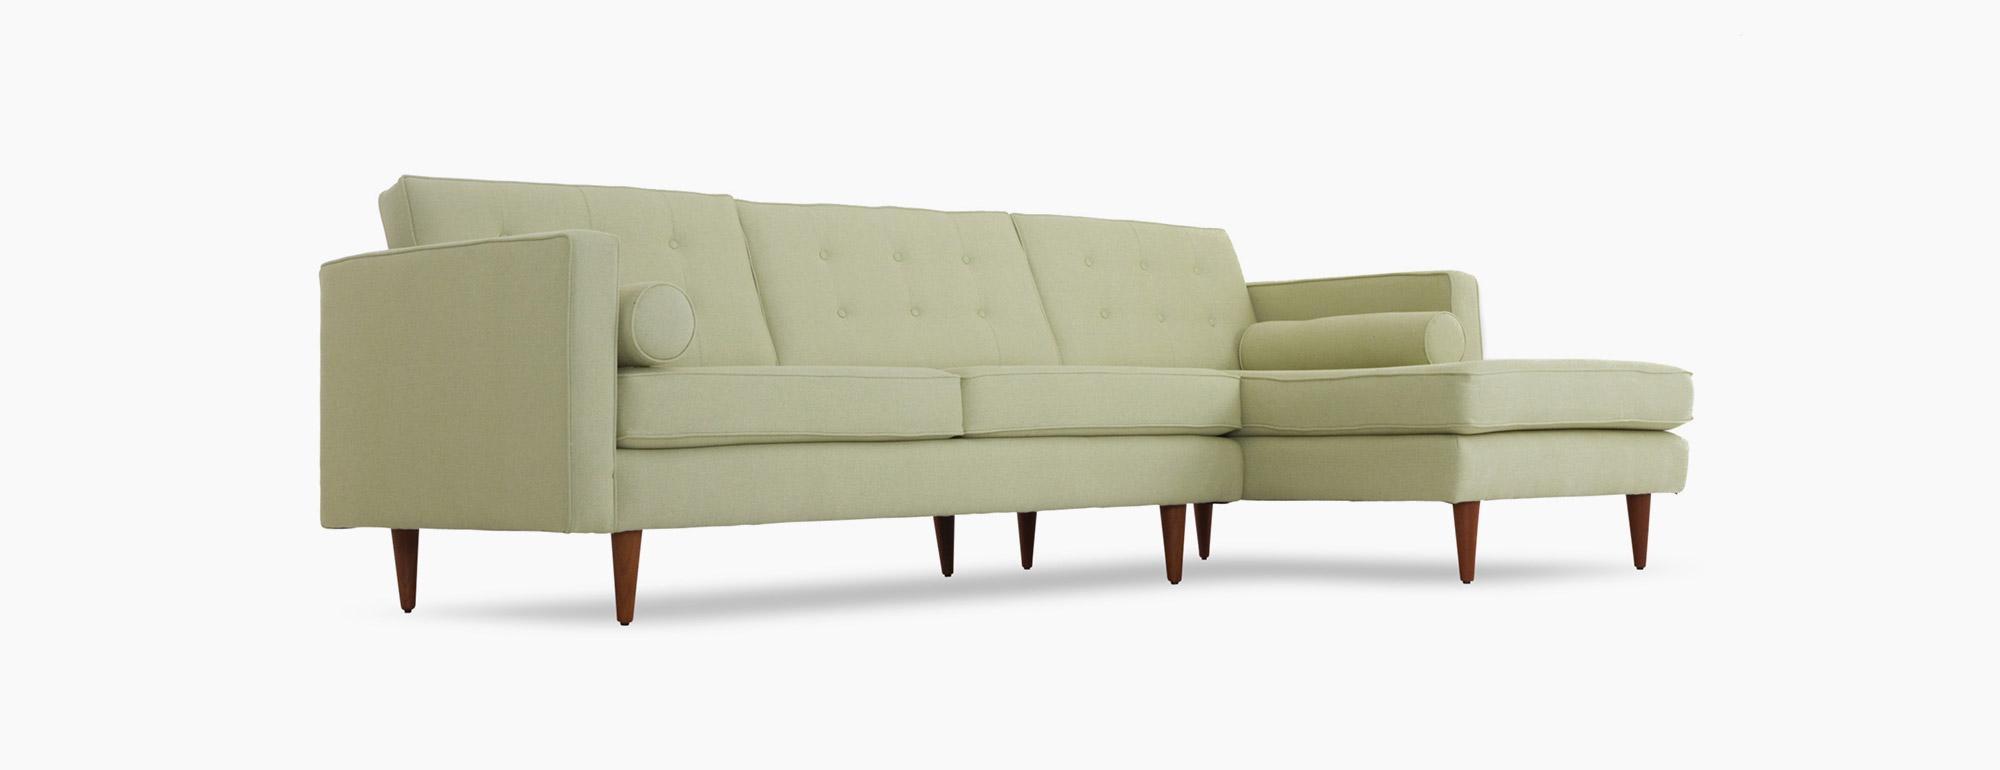 Braxton Sectional | Joybird Regarding Braxton Sectional Sofas (Image 5 of 20)